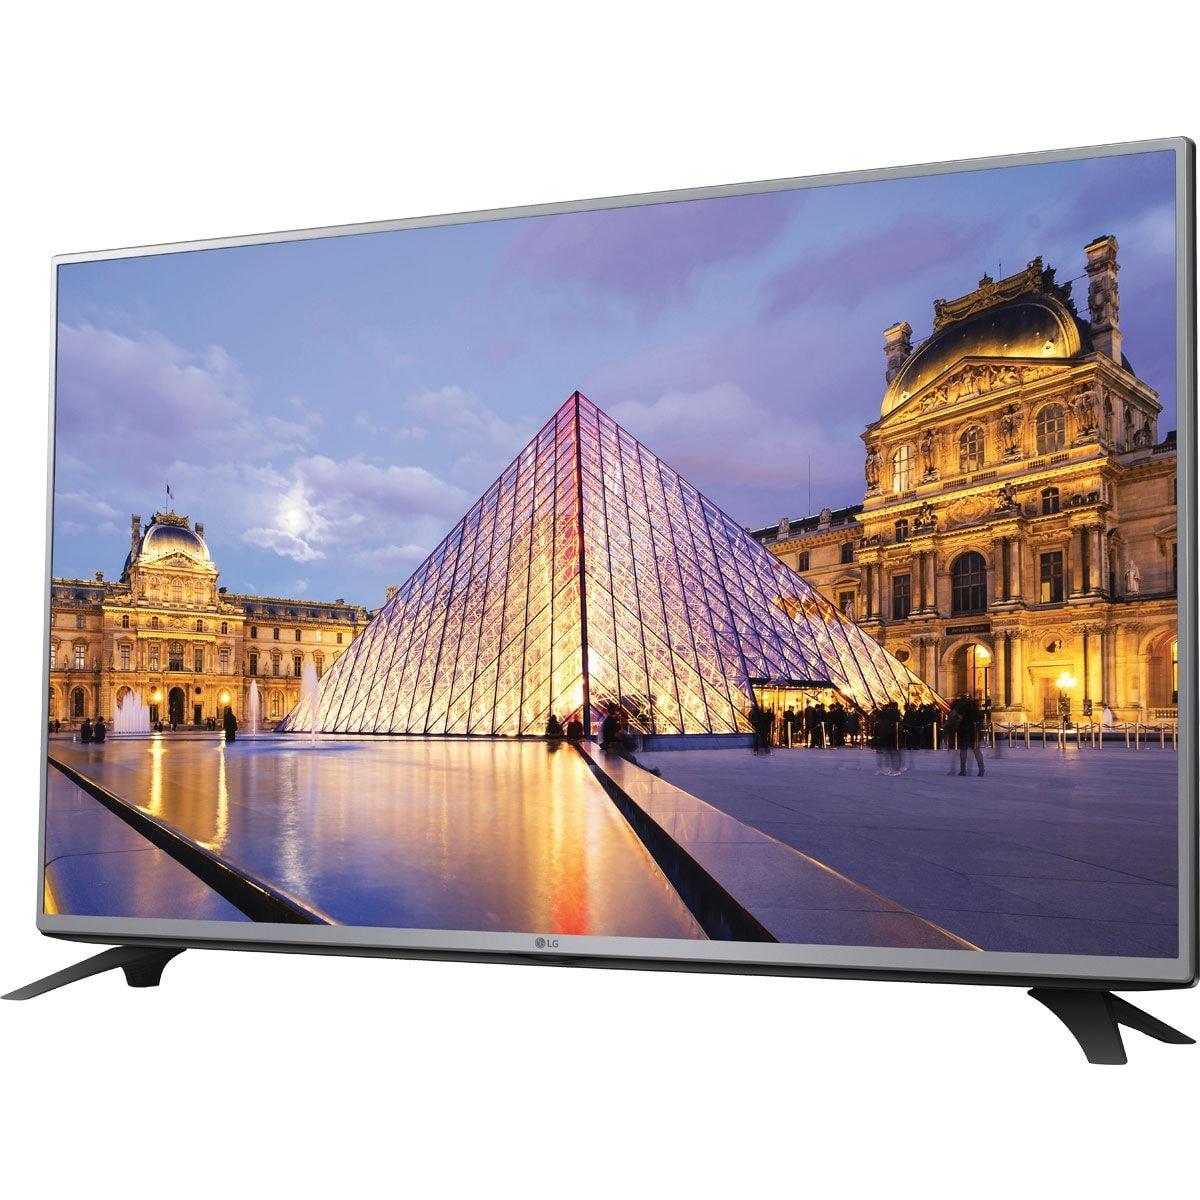 LG 49LF5400 (49LF5400 (8806087237238)) - Achat / Vente TV sur Cybertek.fr - 1